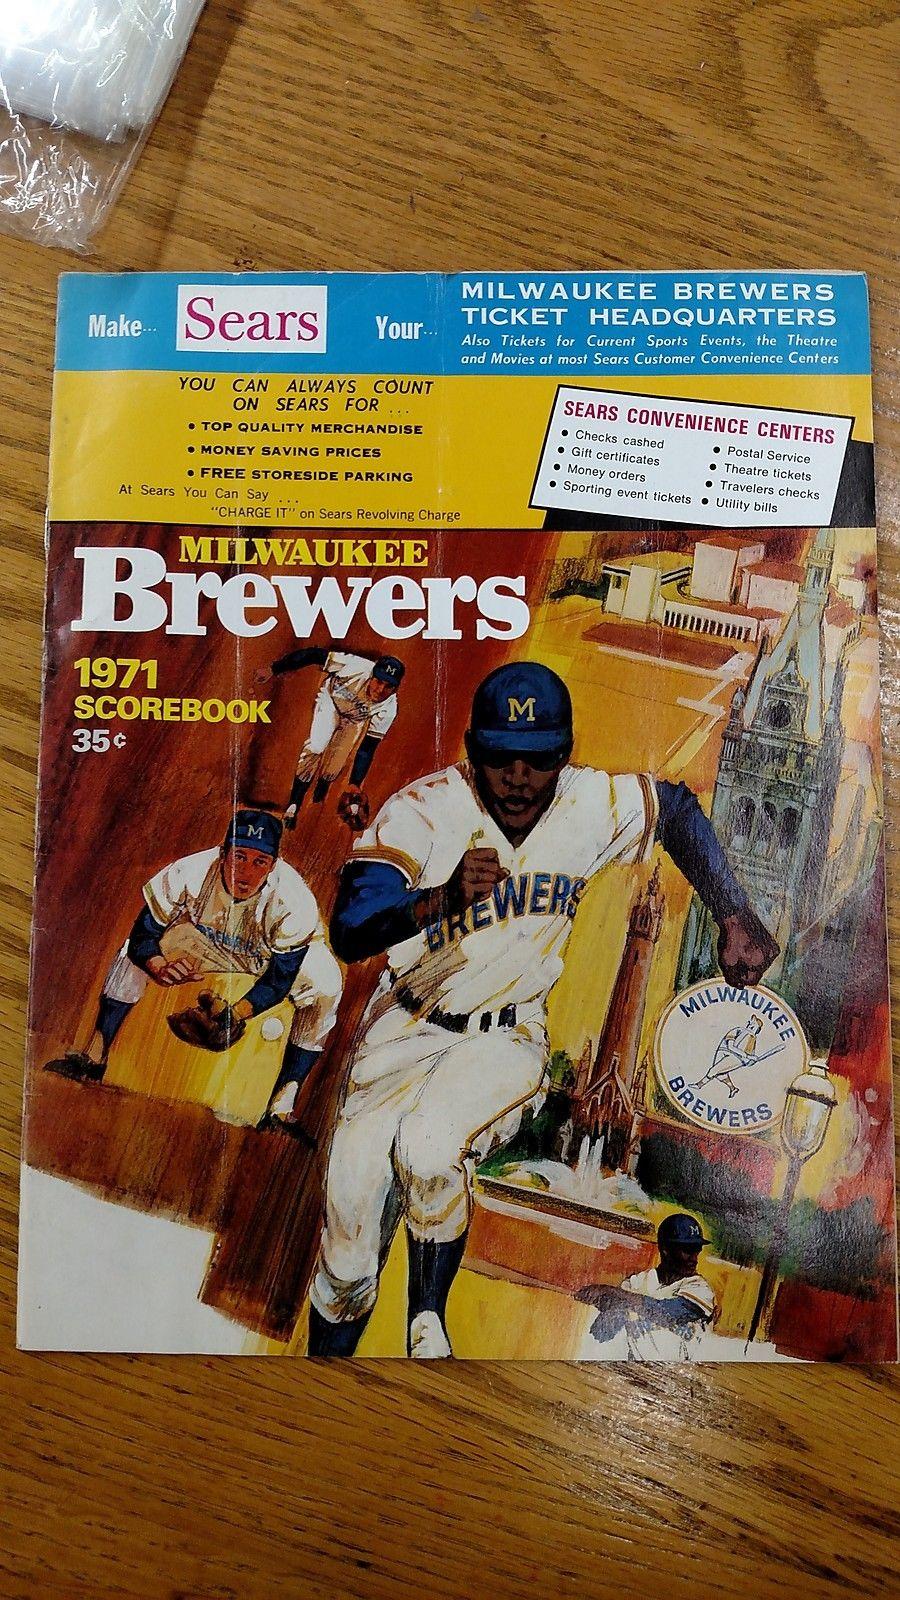 Milwaukee Brewers Bedroom In A Box Major League Baseball: 1971 Official Milwaukee Brewers MLB Baseball Scorebook